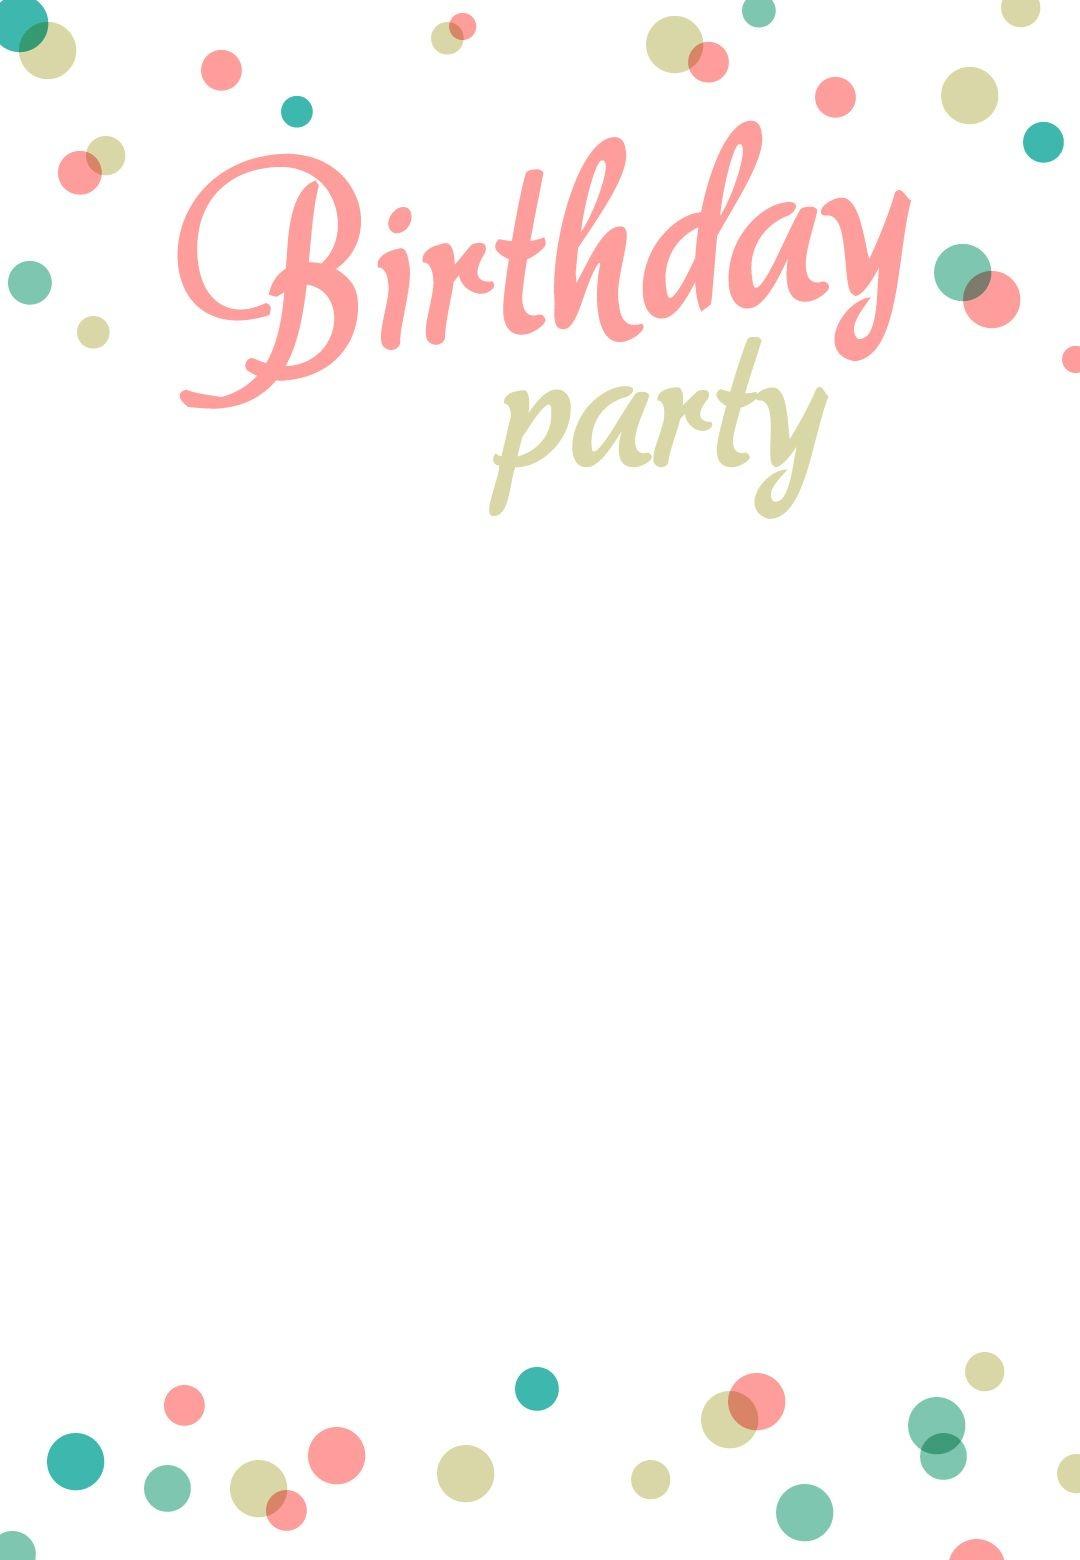 Birthday Party #invitation Free Printable   Invitations   Pinterest - Free Printable Birthday Invitations Pinterest